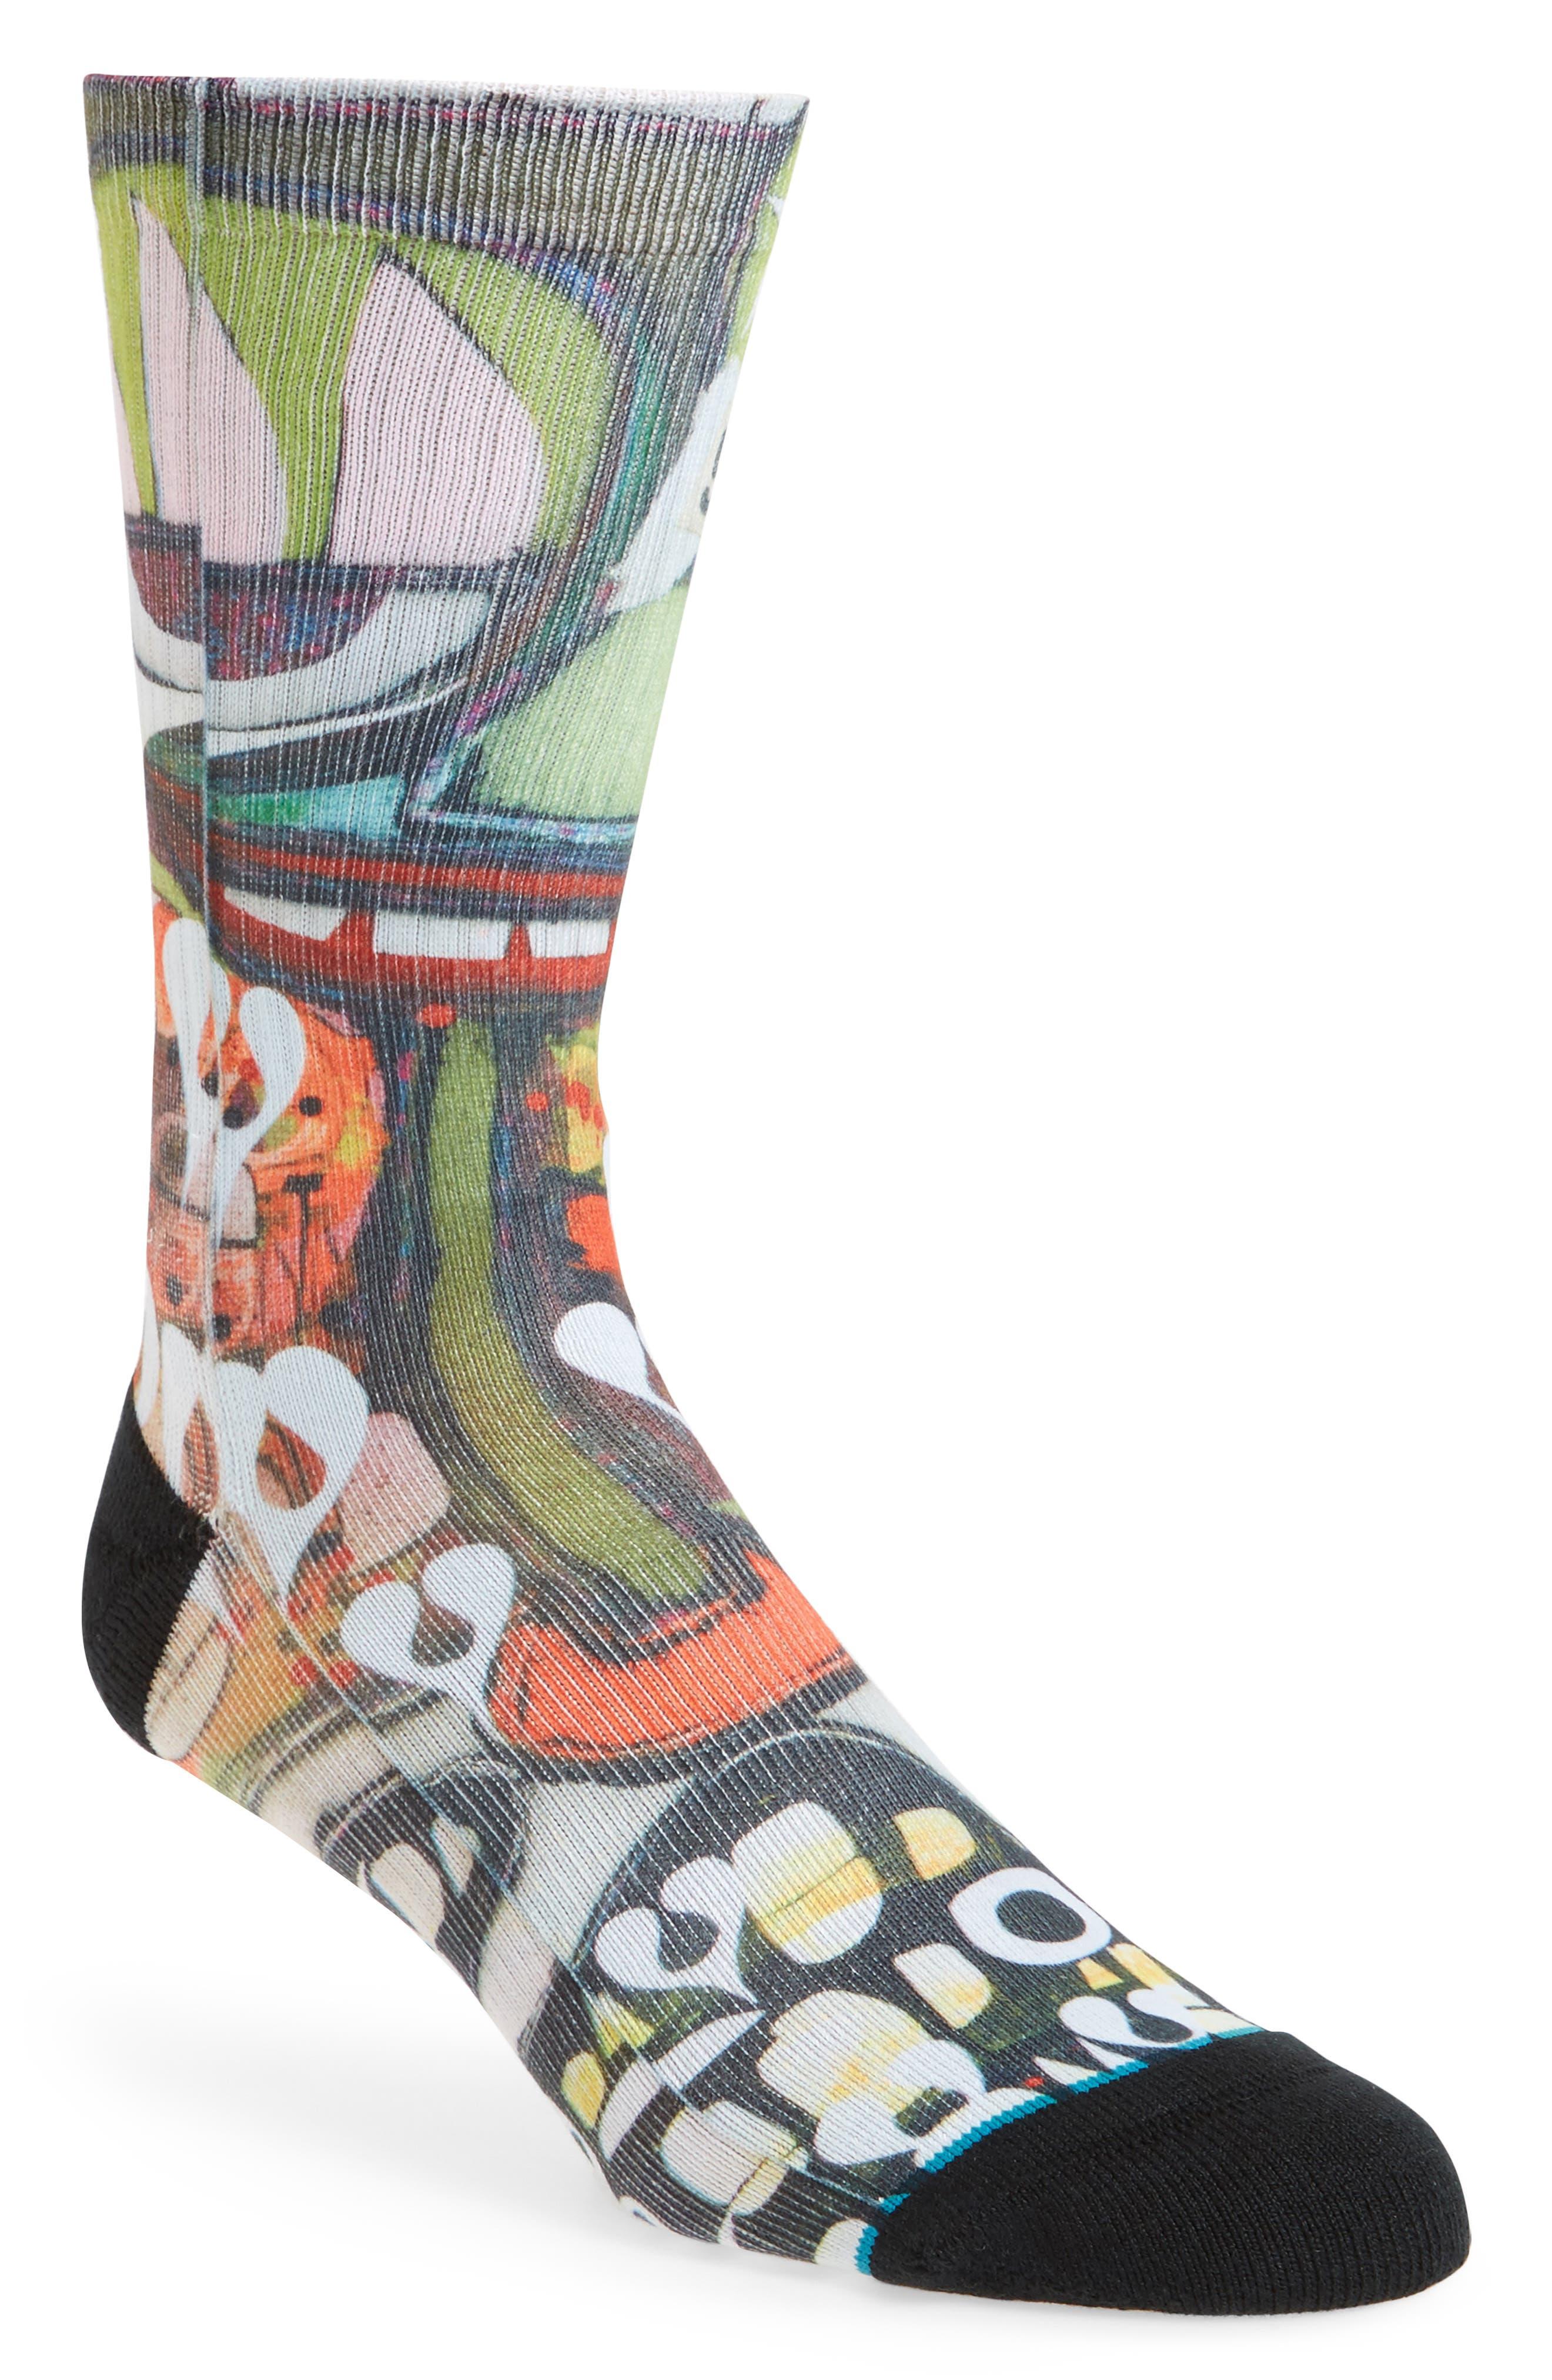 Frost Heart Socks,                             Main thumbnail 1, color,                             400